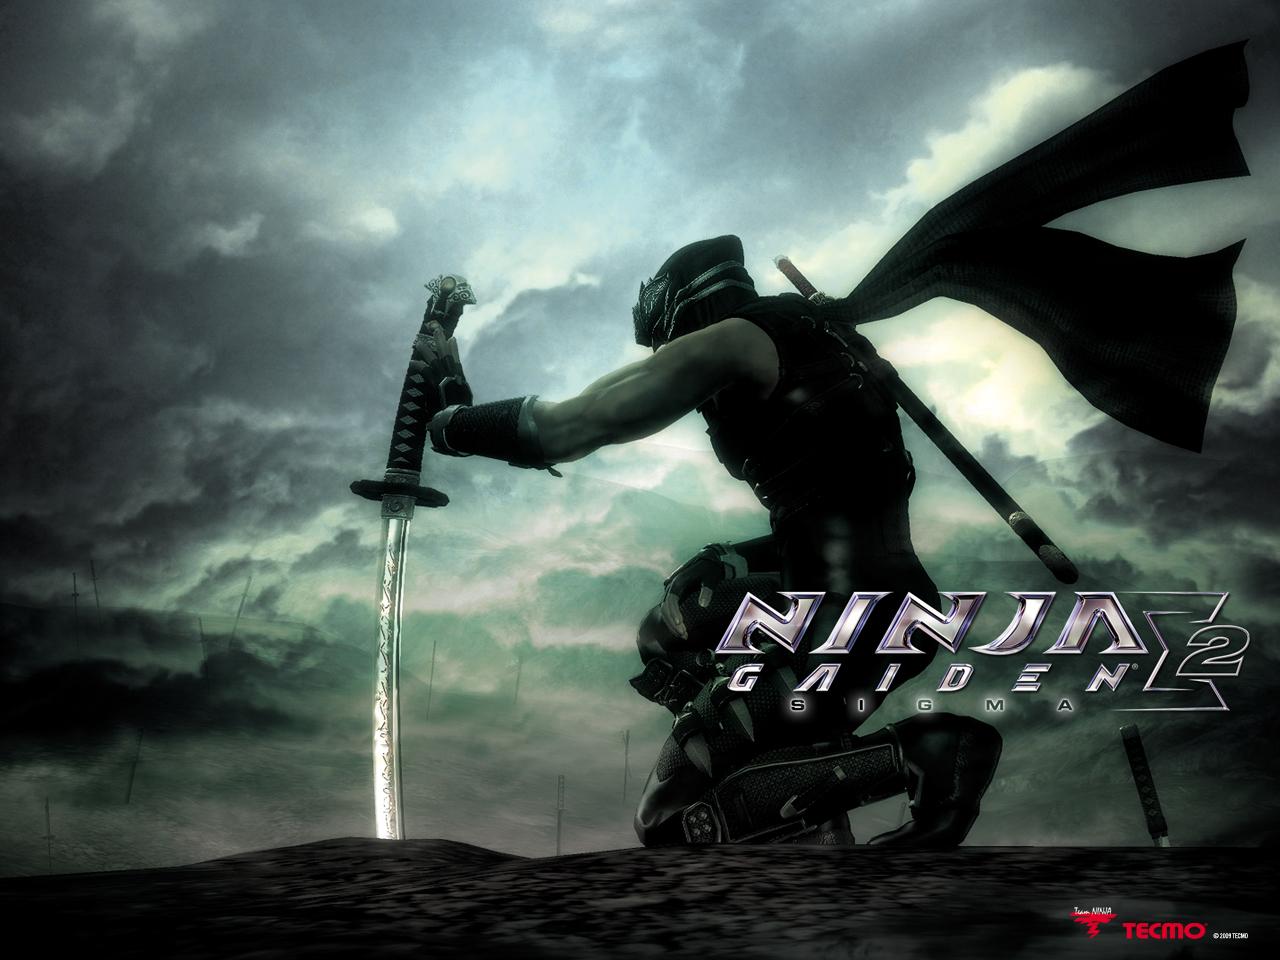 Ninja wallpaper hd Funny Amazing Images